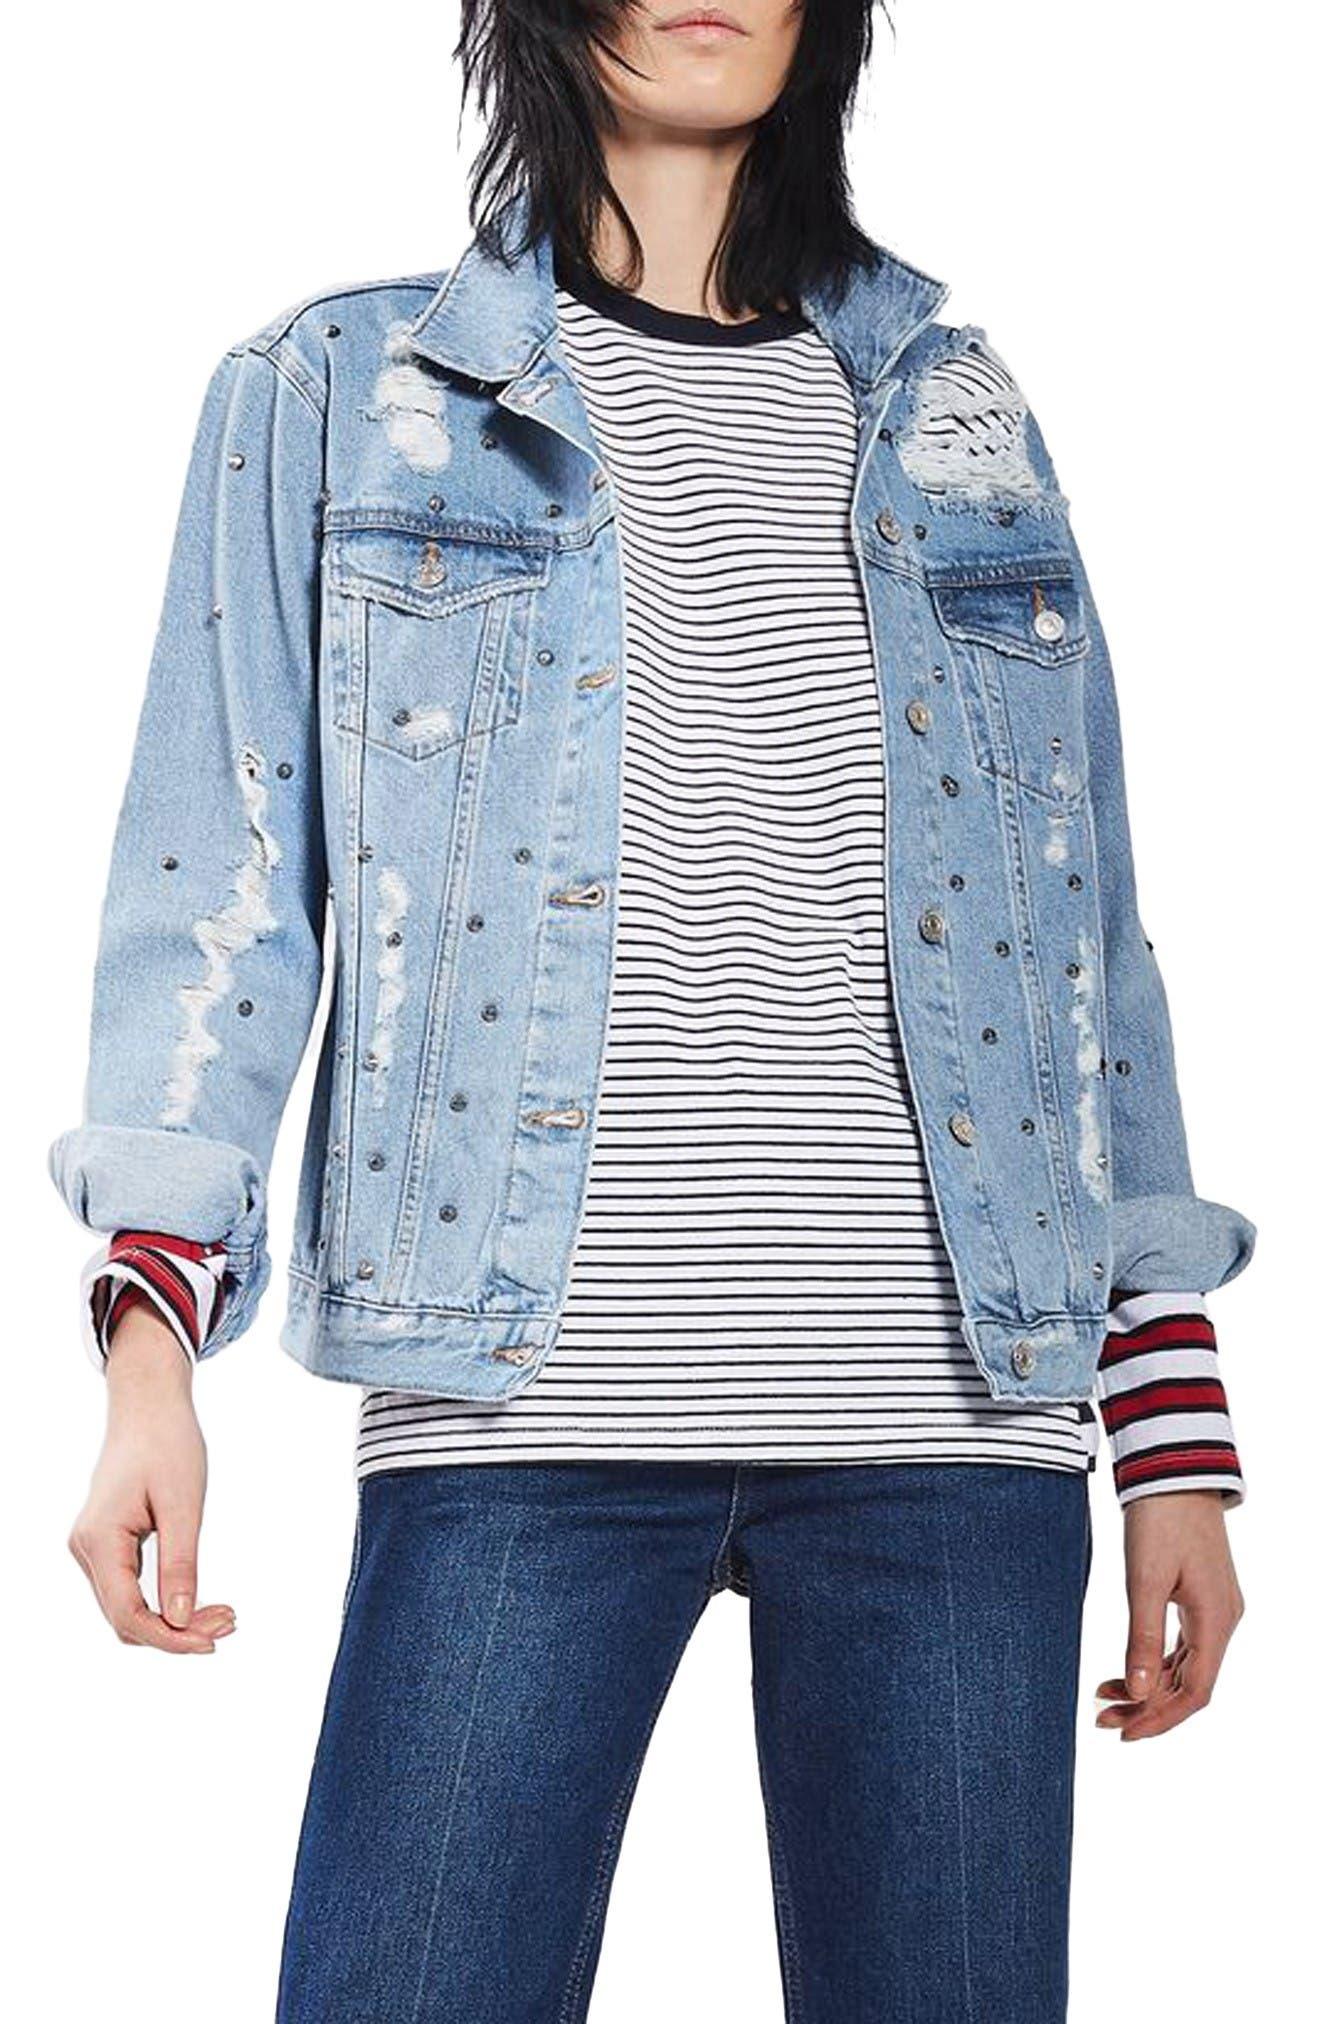 Alternate Image 1 Selected - Topshop Studded Distressed Denim Jacket (Regular & Petite)